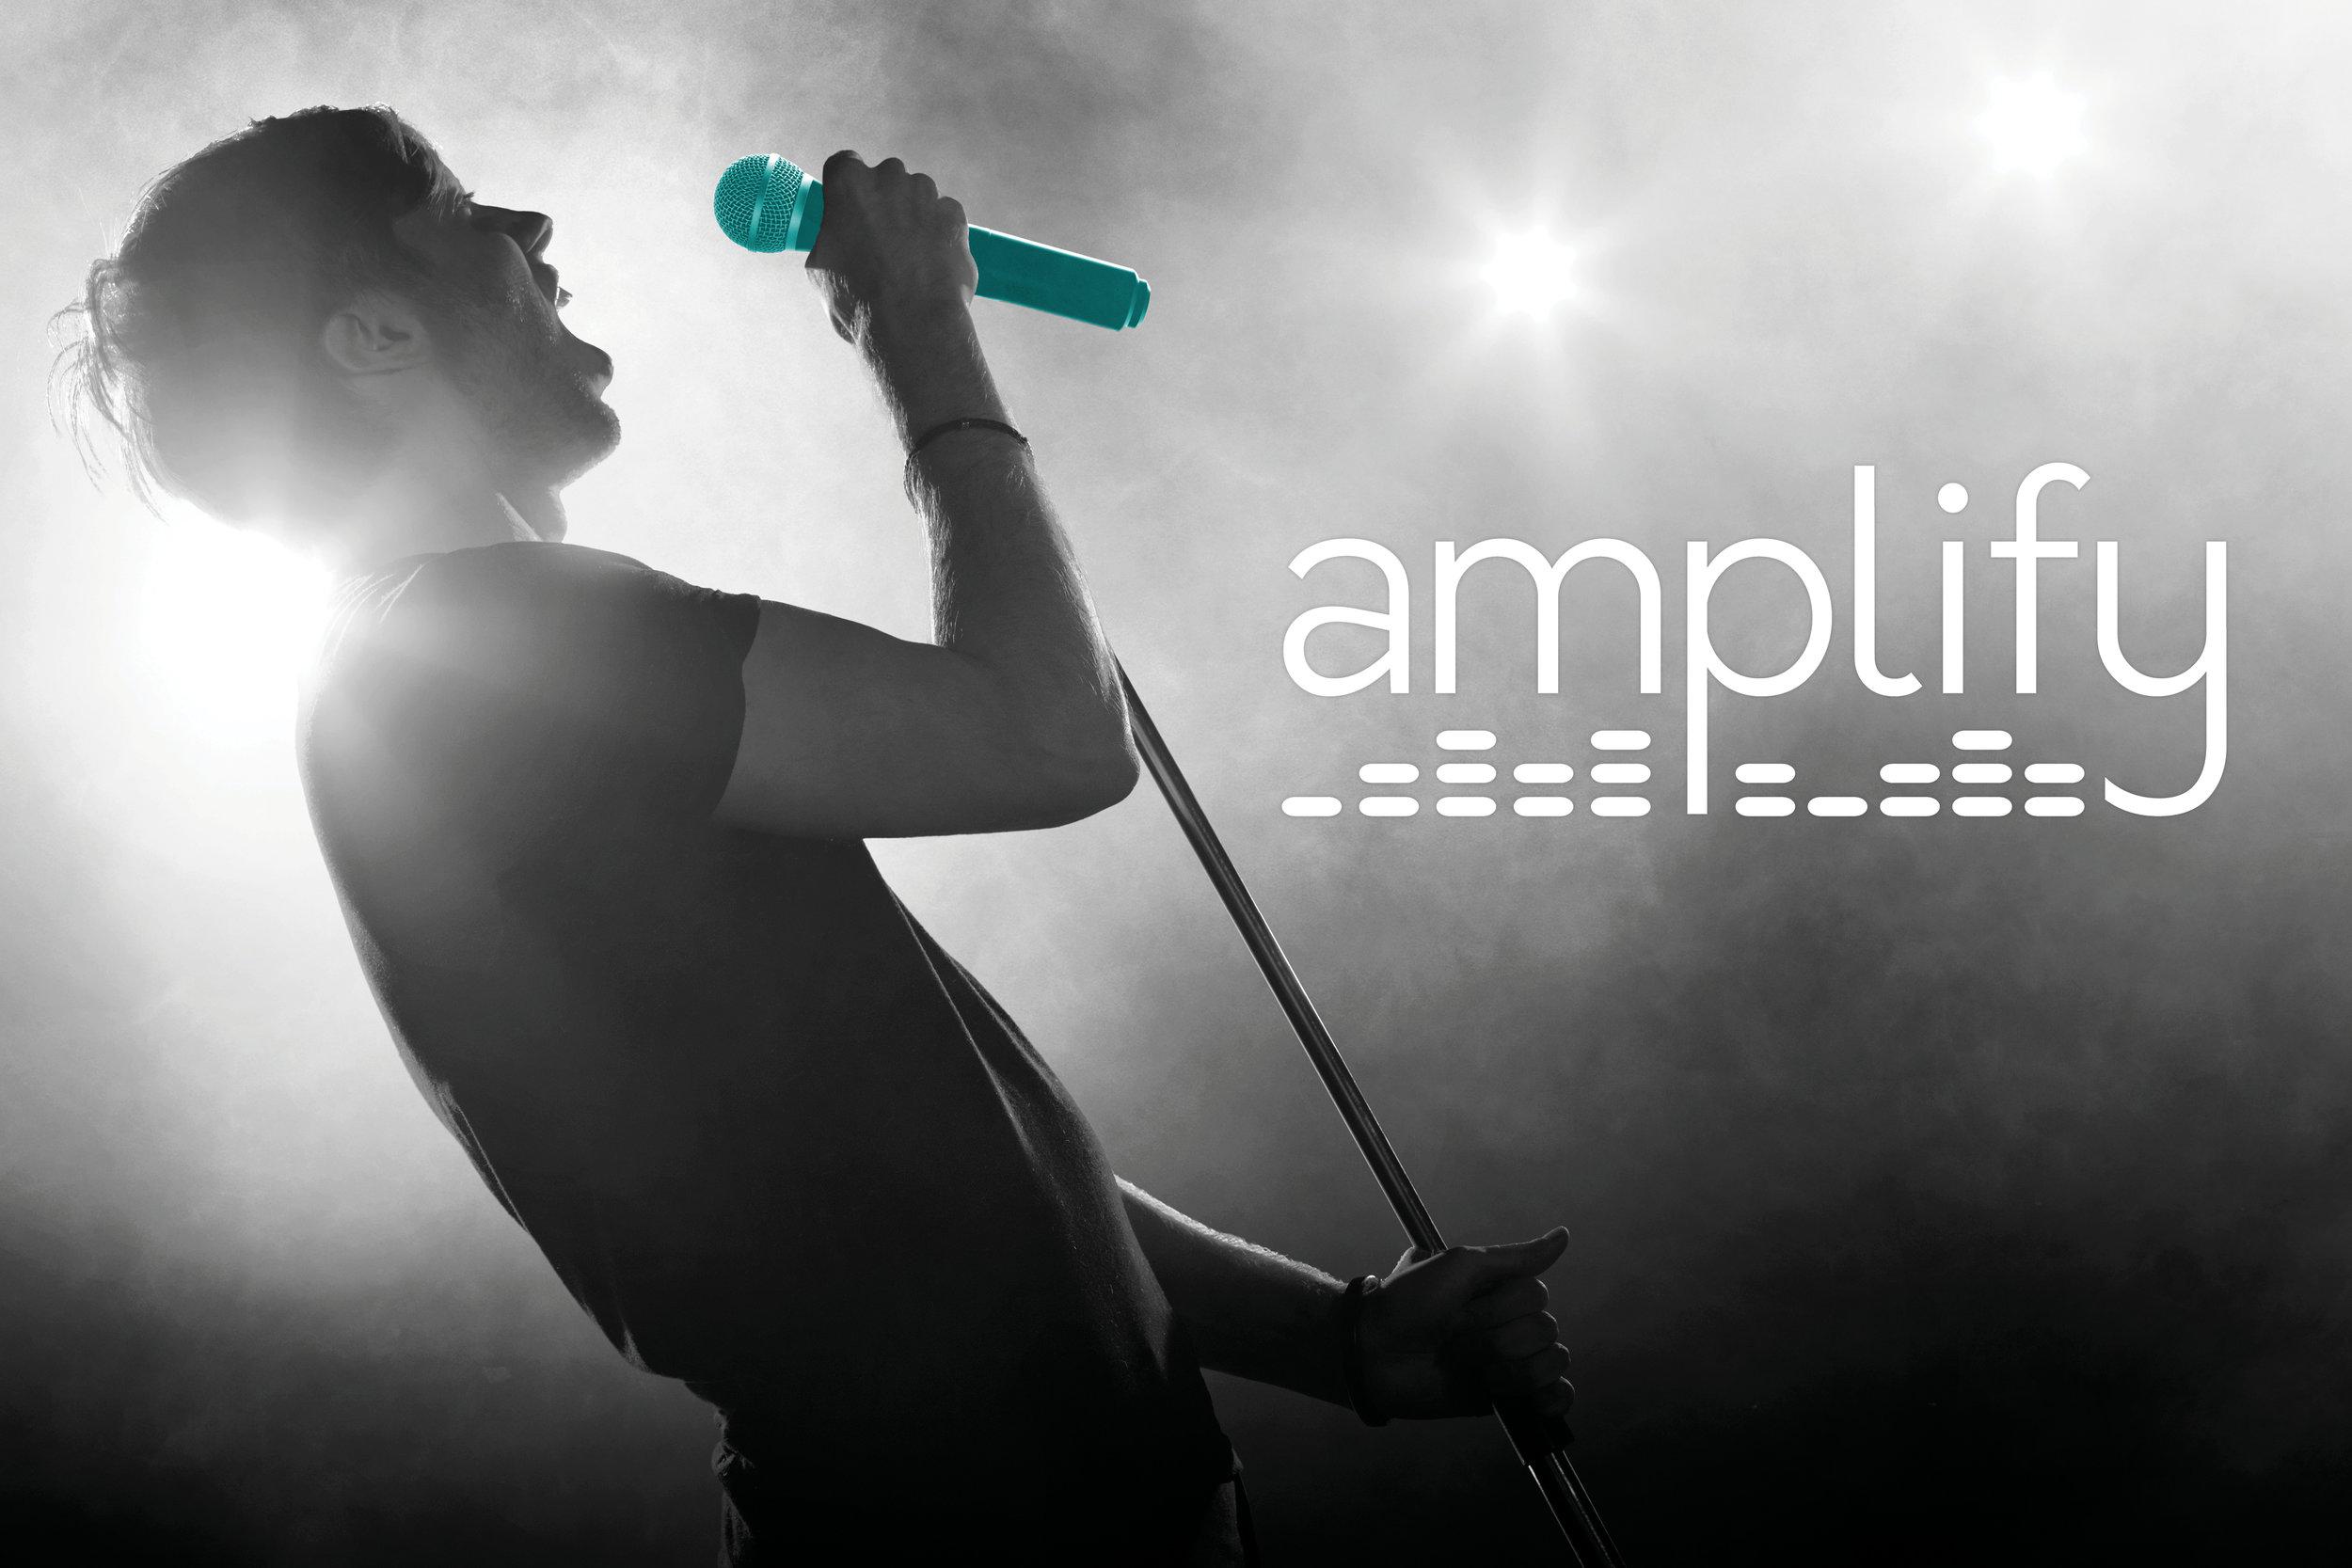 Amplify Image_1.jpg